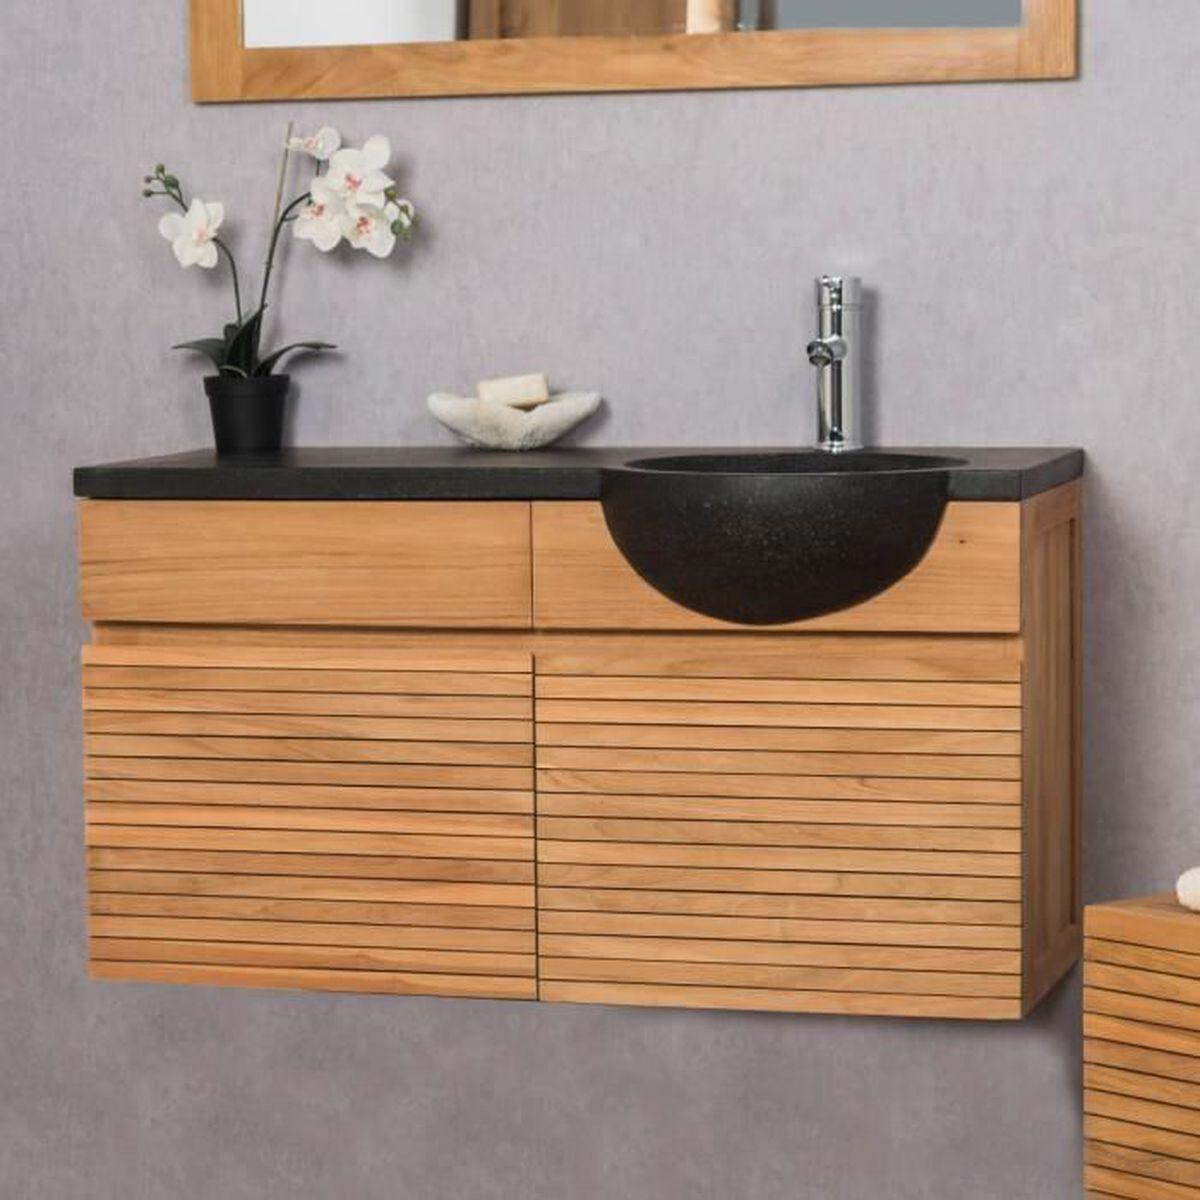 Salle De Bain Avec Bois meuble salle de bain bois exotique